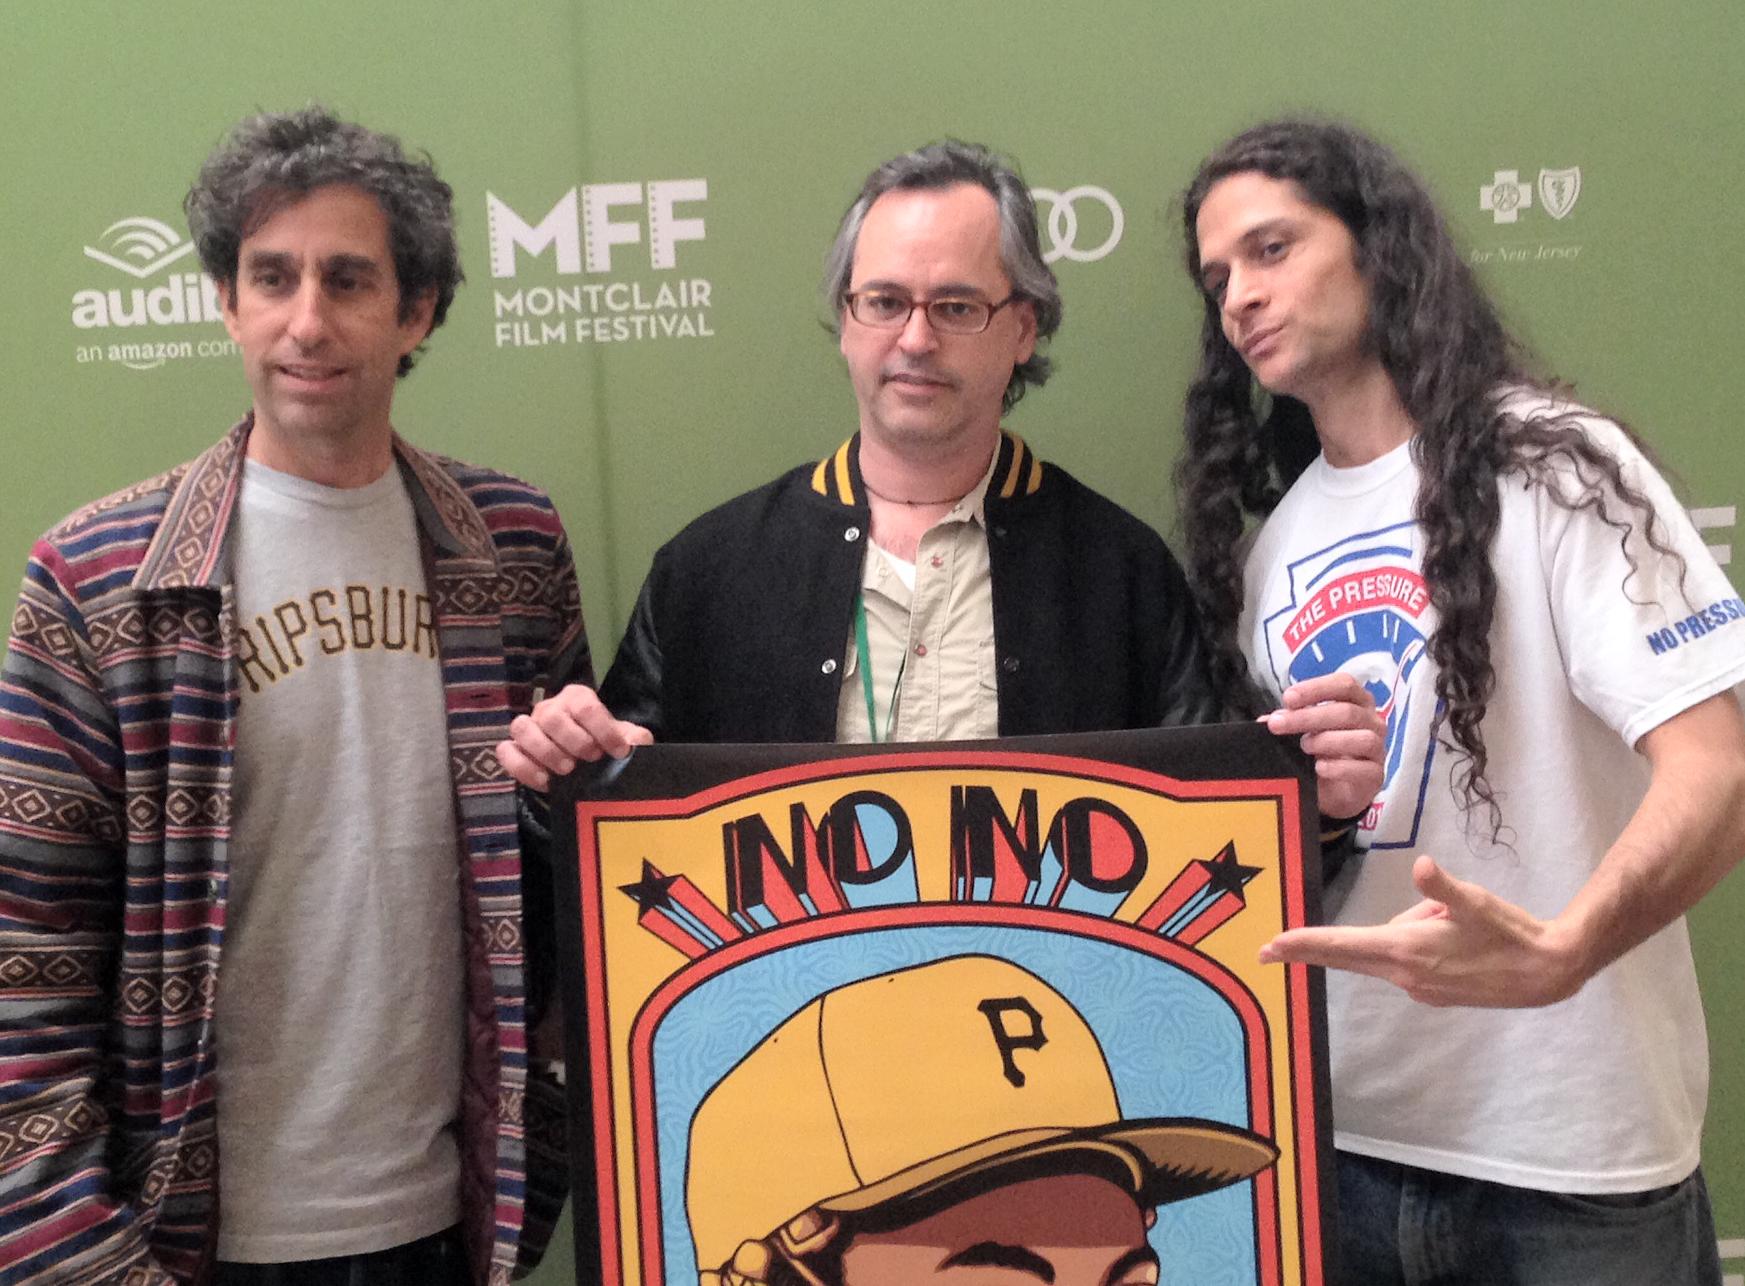 Glenn E. Friedman, photographer; Jeffrey Radice, Director, 'No, No: A Dockumentary; Carlos Canedo, Producer Photo by Bill Battle / Montclair Film Festival